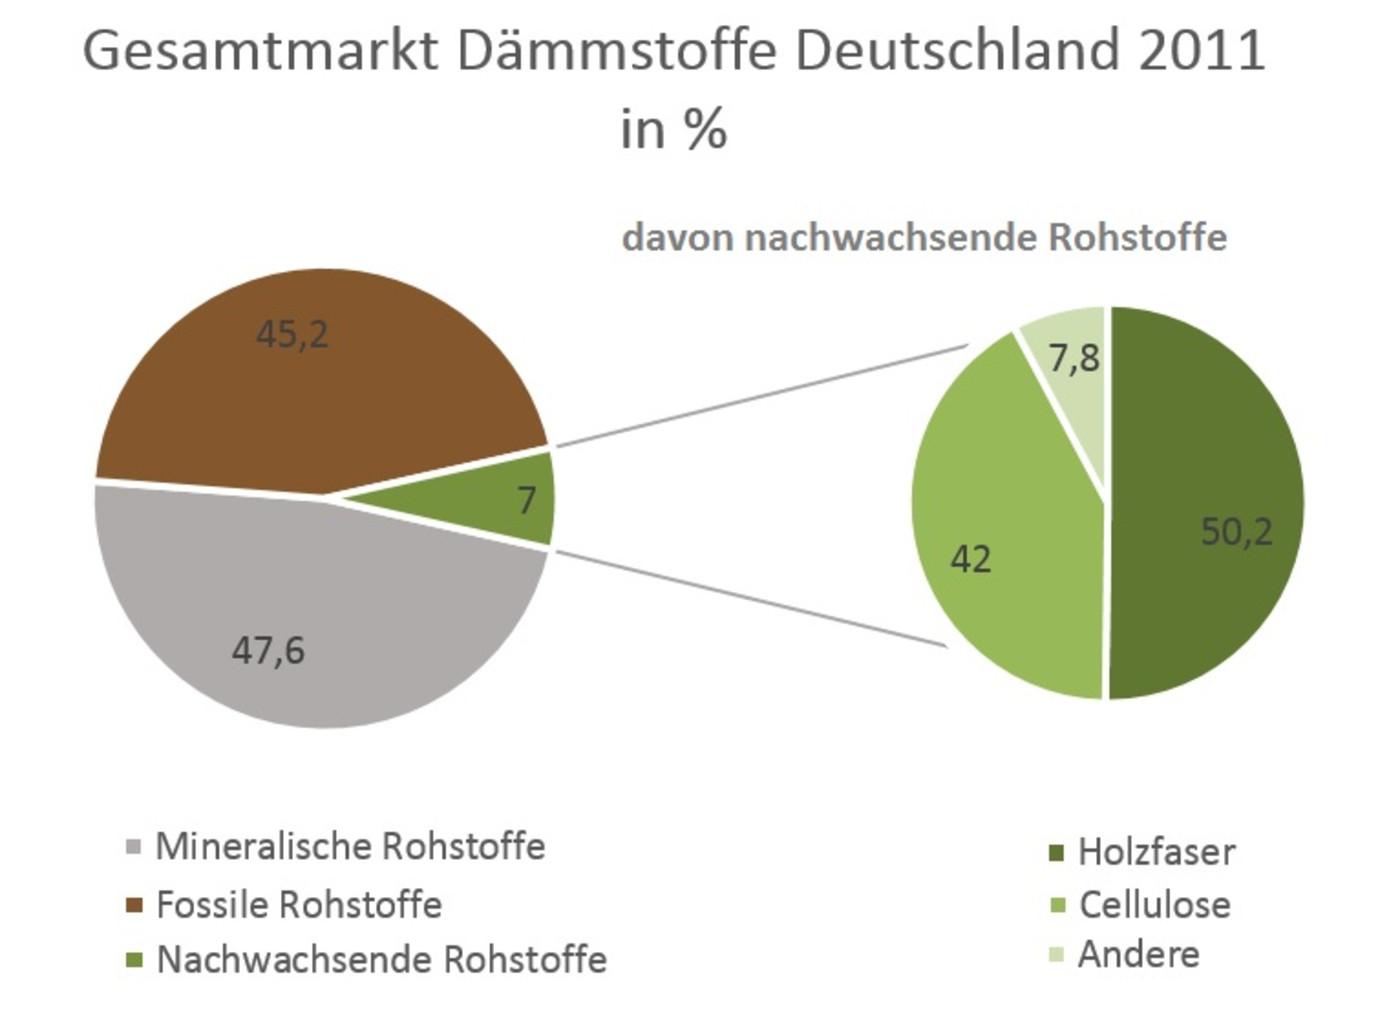 Deutsche Umwelthilfe e.V.: Nachhaltige Dämmstoffe